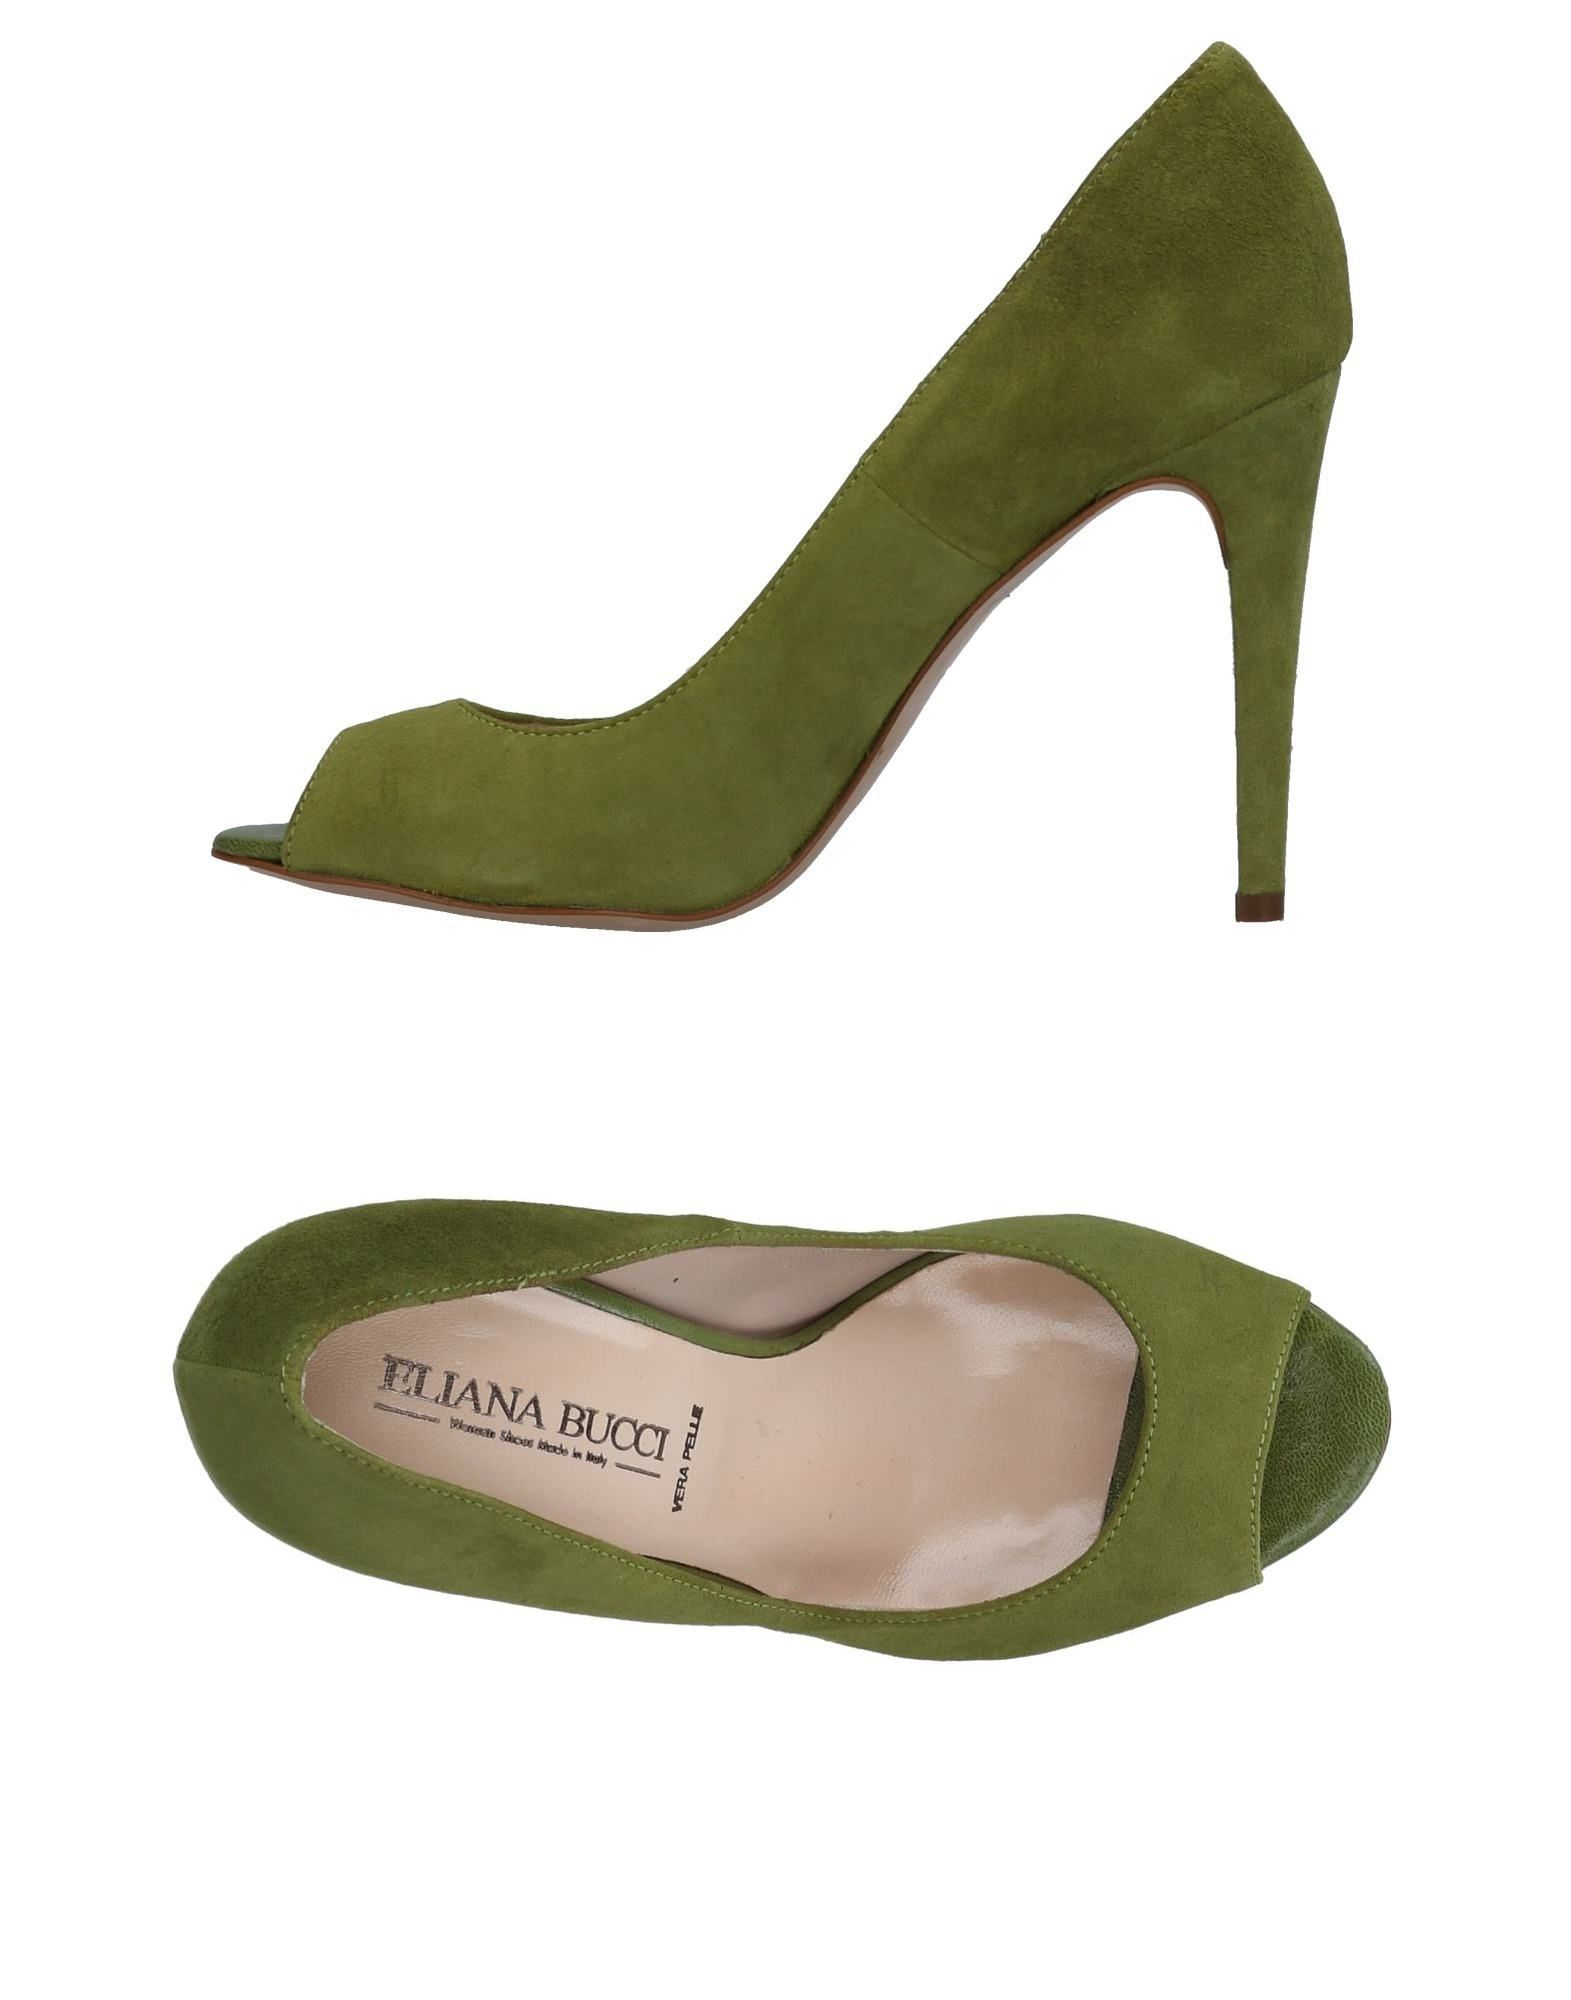 Escarpins Eliana Bucci Femme - Escarpins Eliana Bucci sur